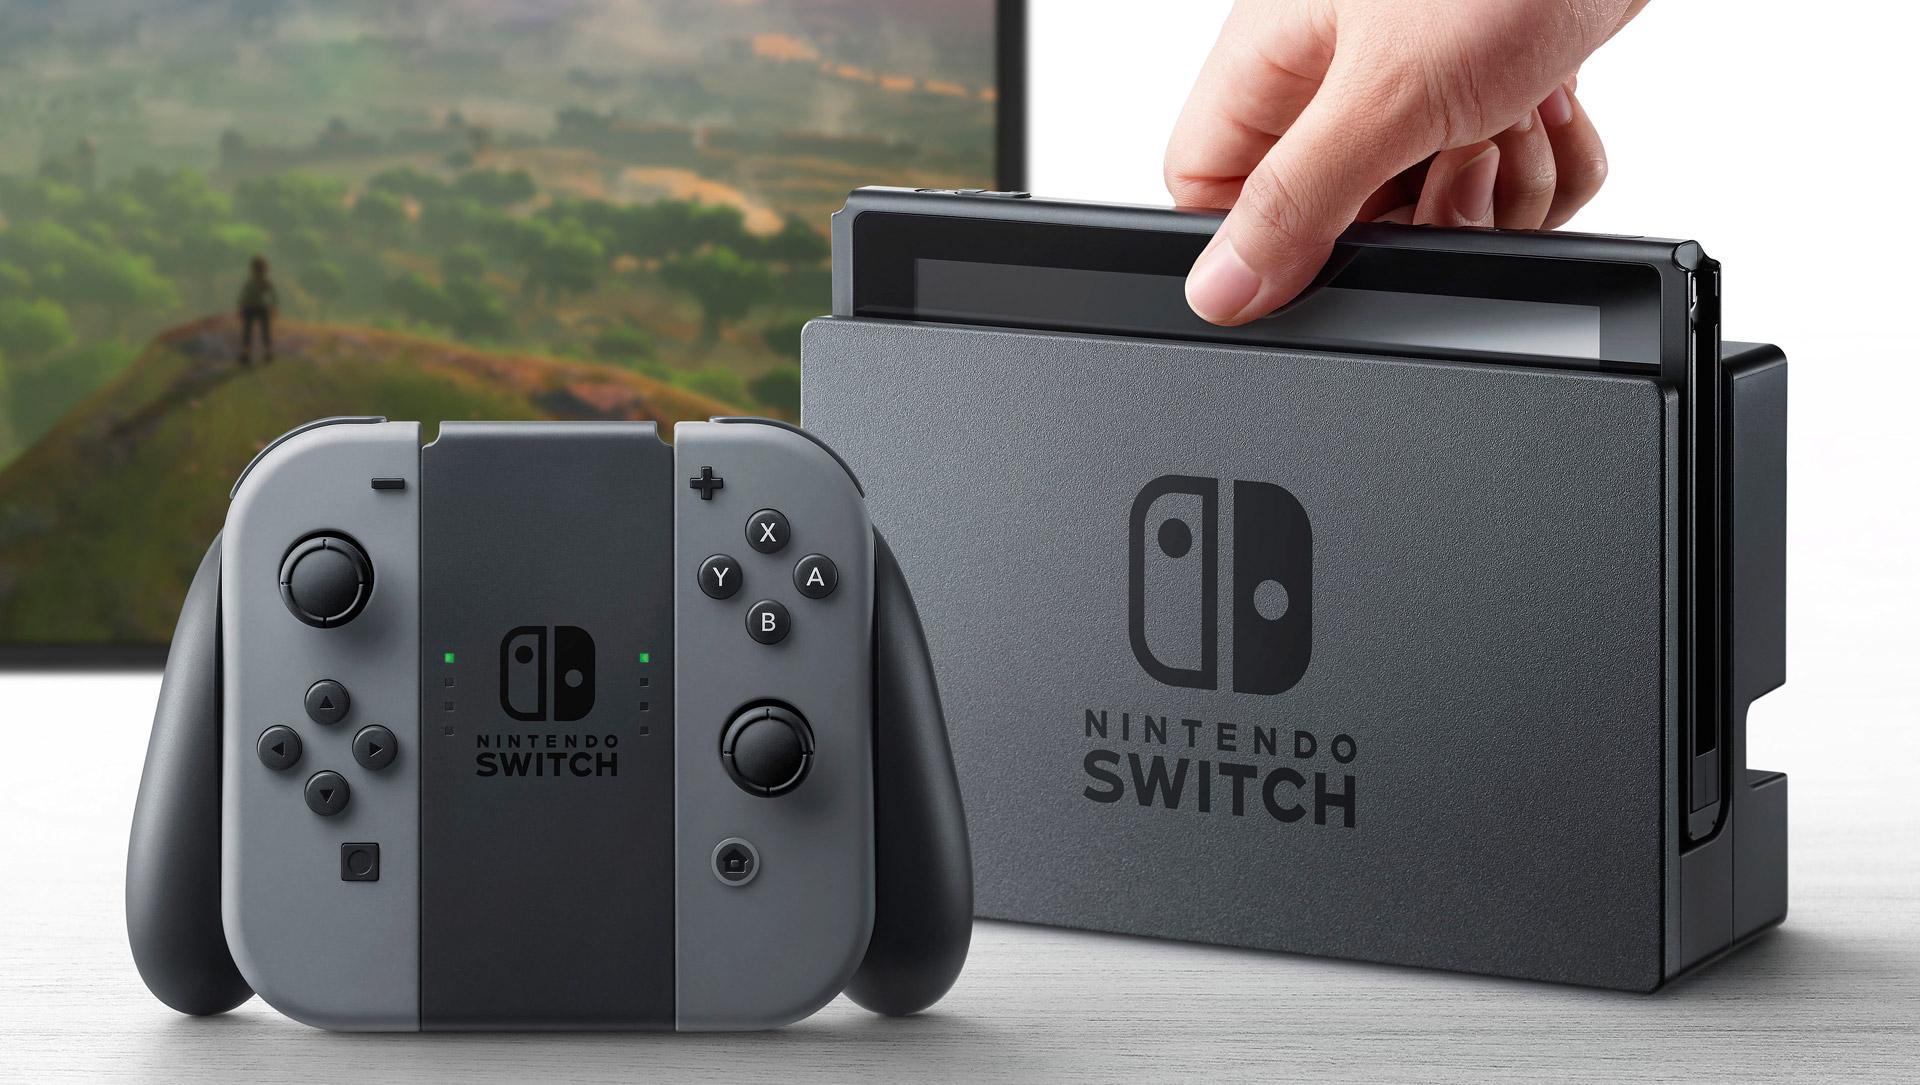 llega-nueva-actualizacion-firmware-nintendo-switch-frikigamers.com